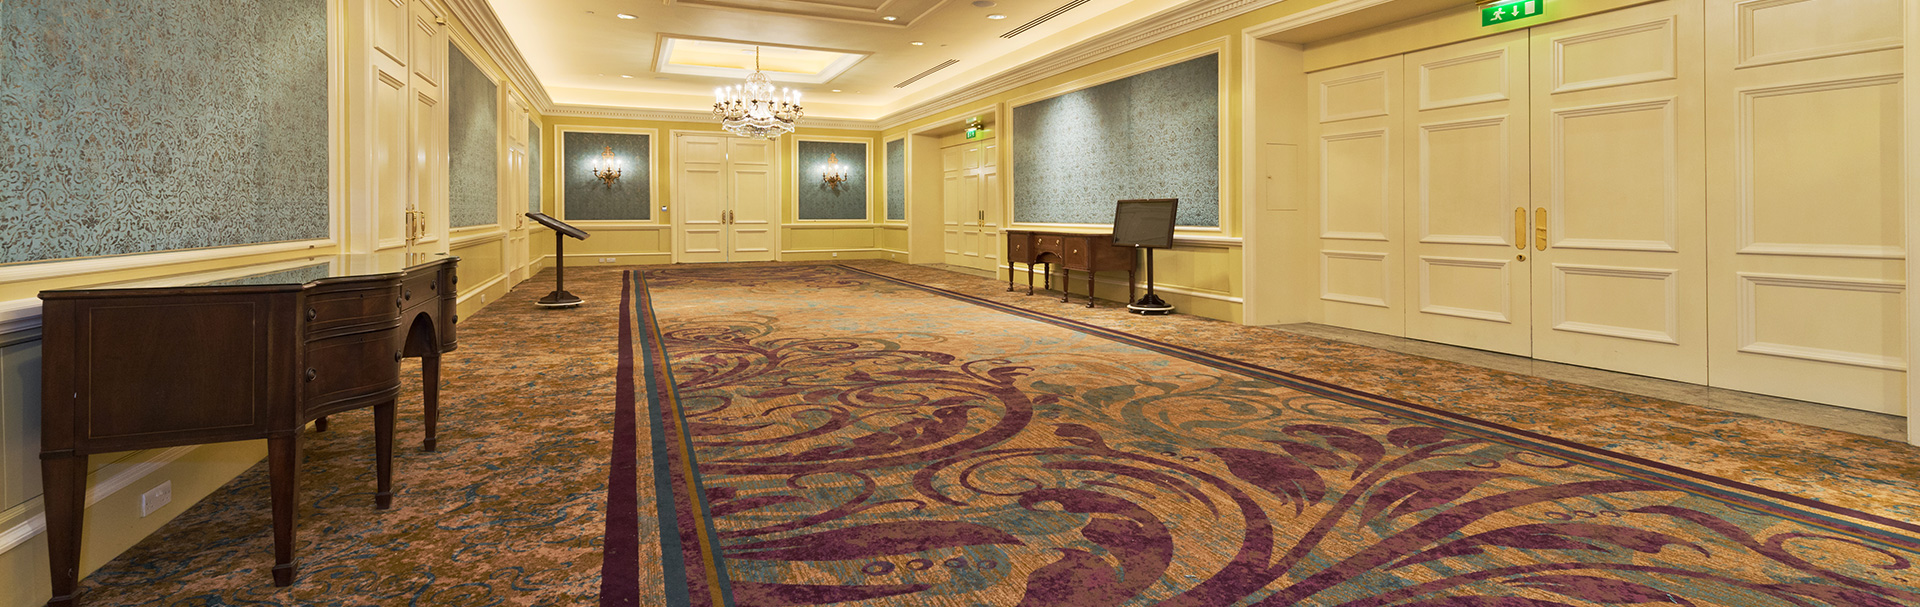 John Lynch Carpets -